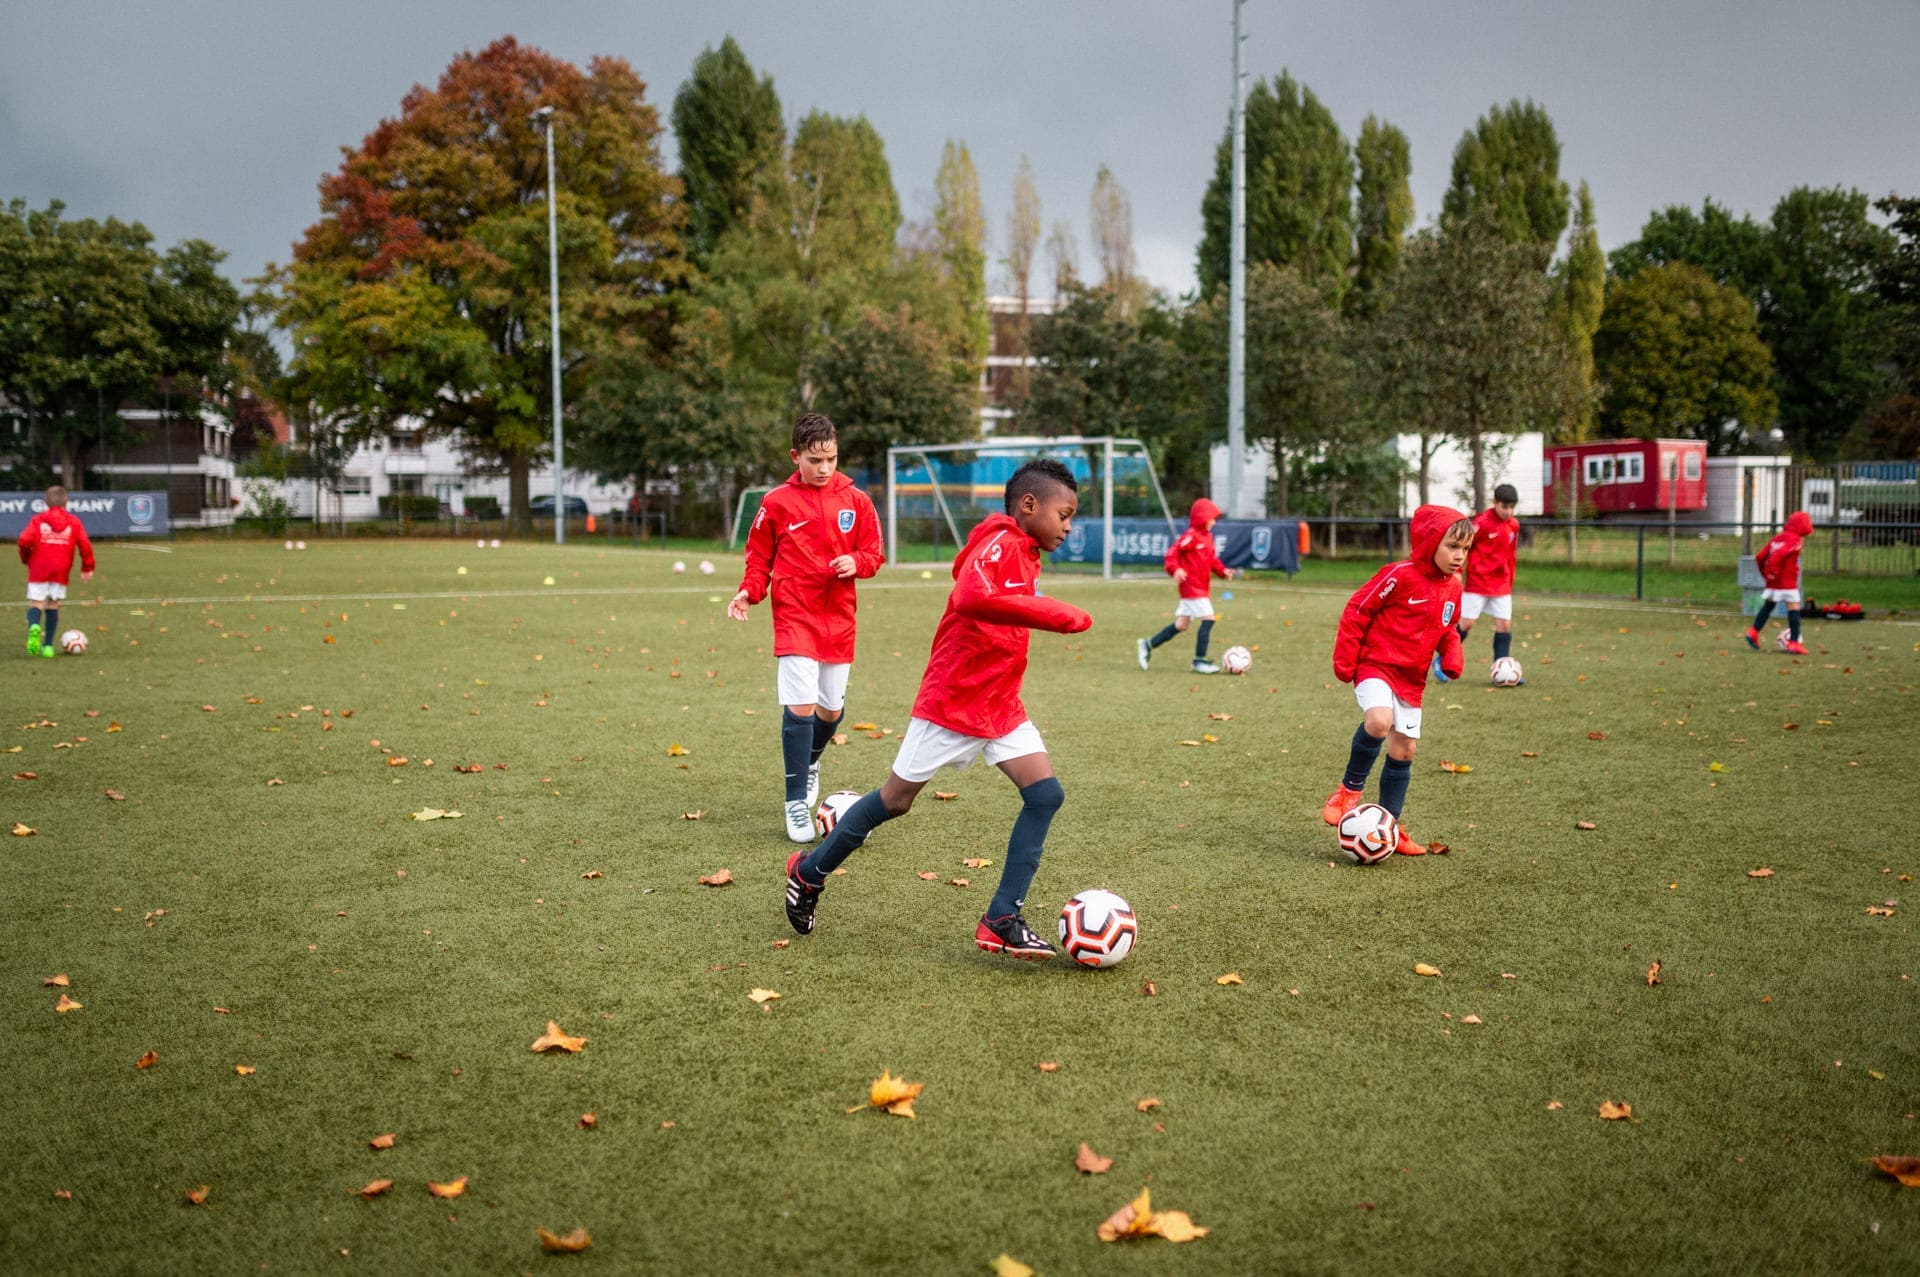 PSG Academy Germany Trainingseinheit im Regen training session in the rain